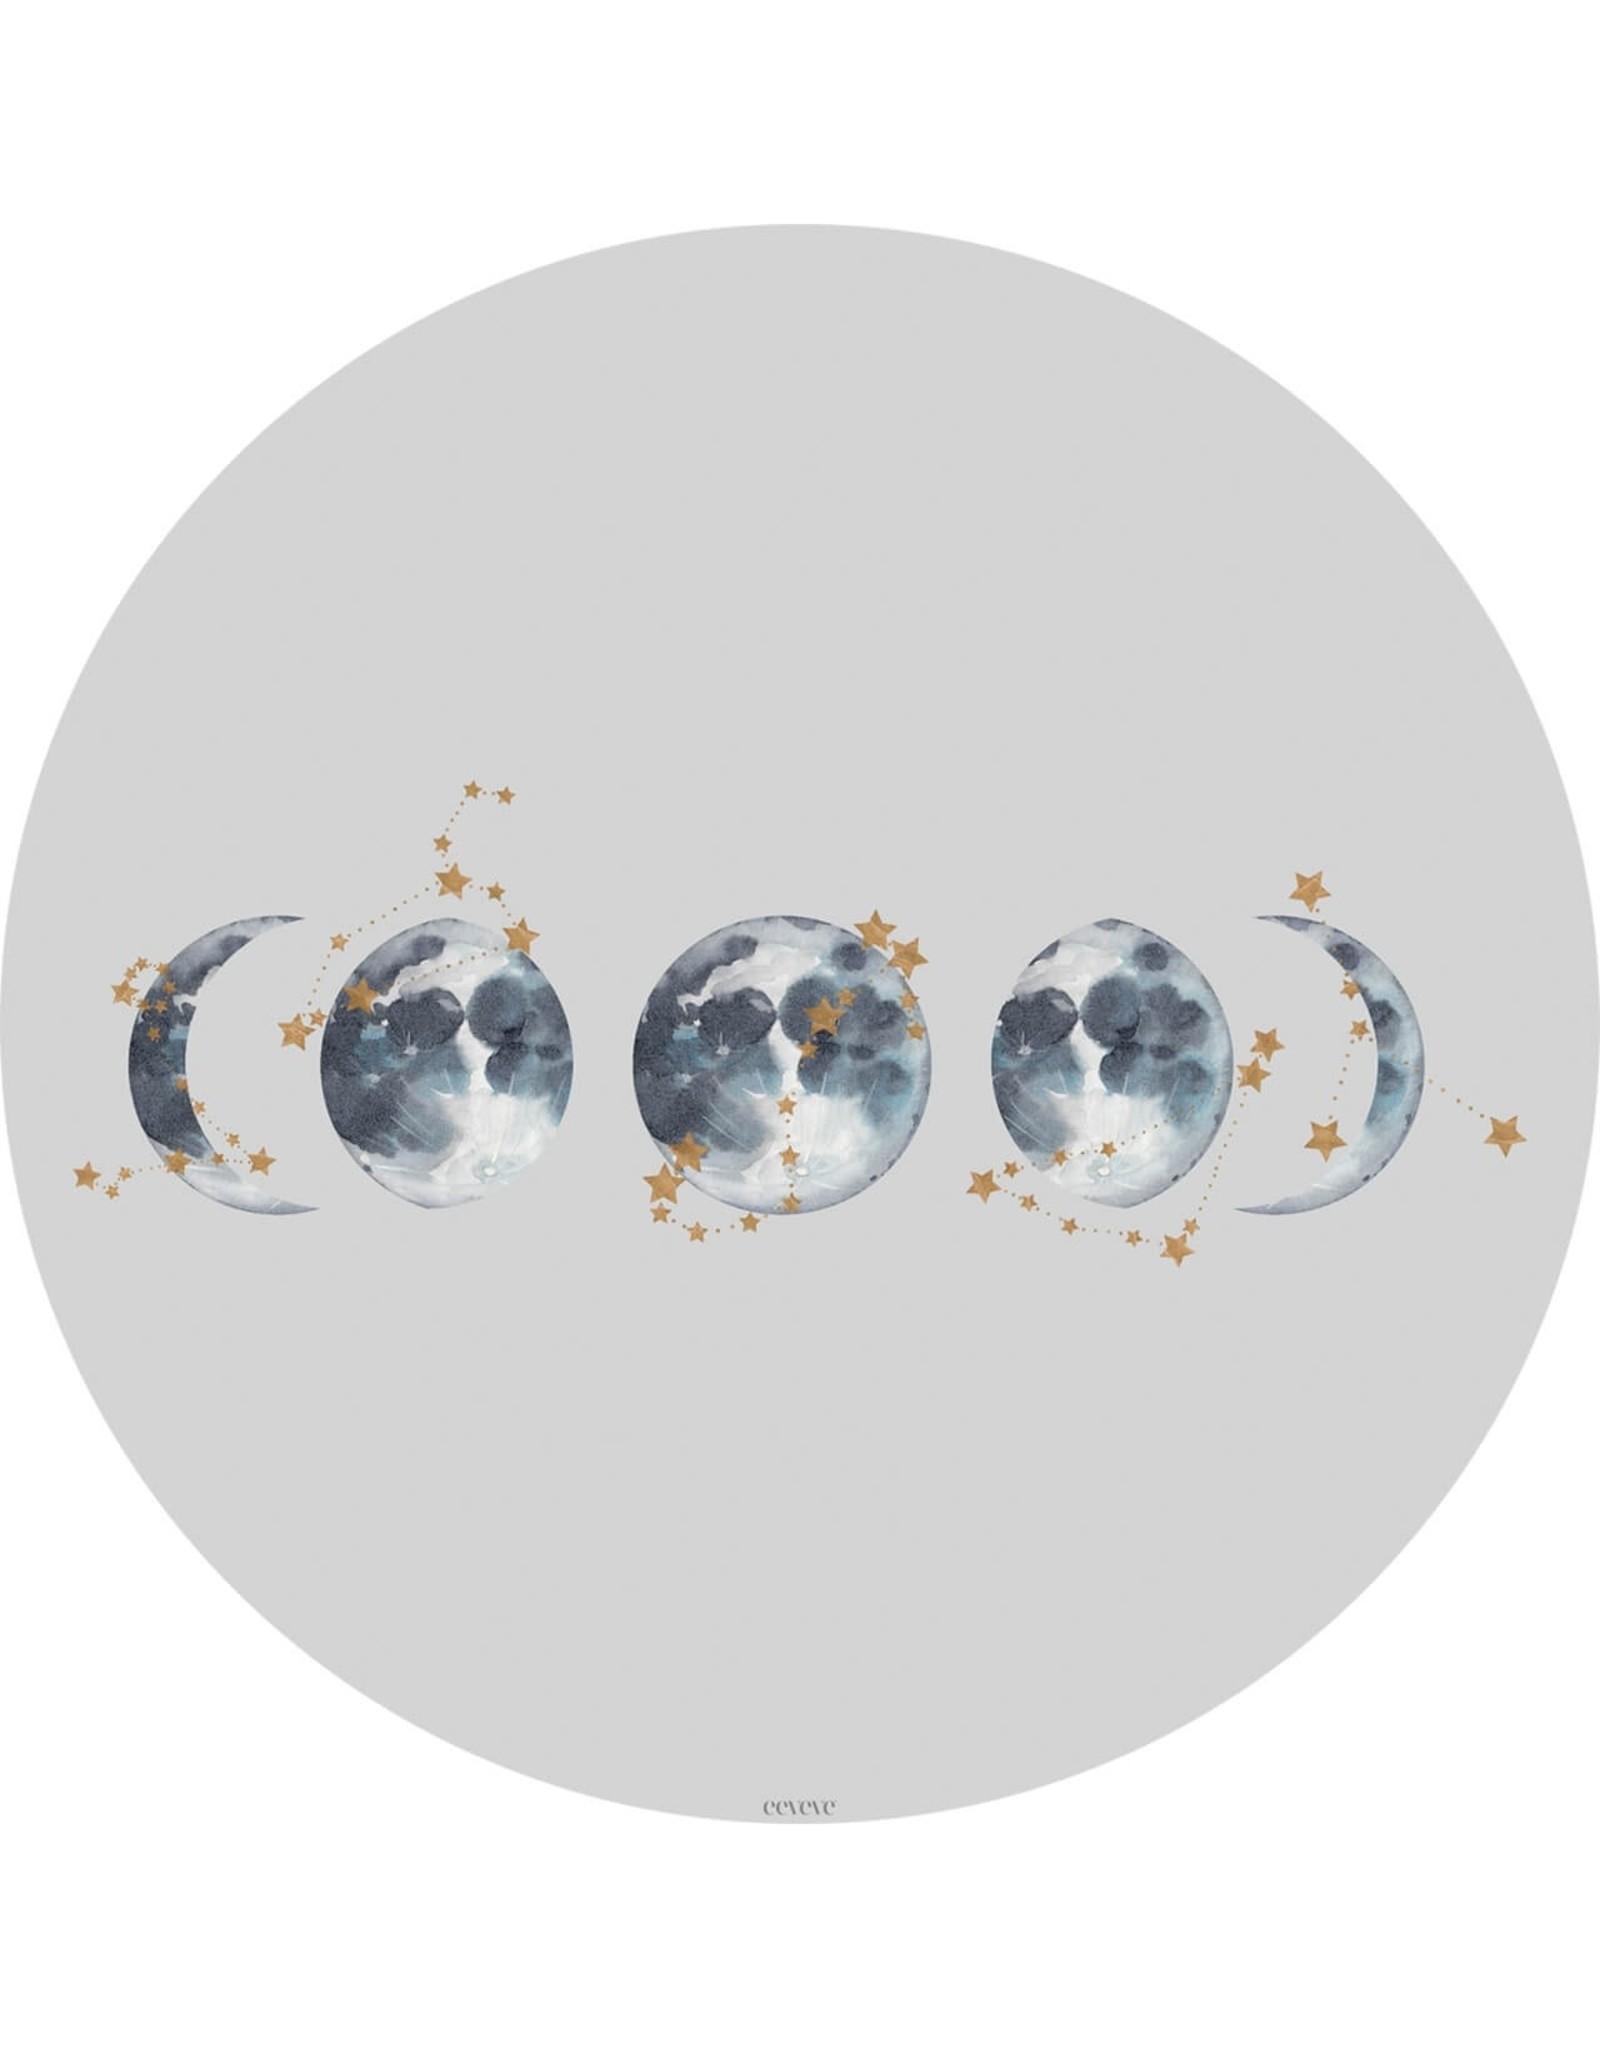 Eeveve Lunar eclipse light gray